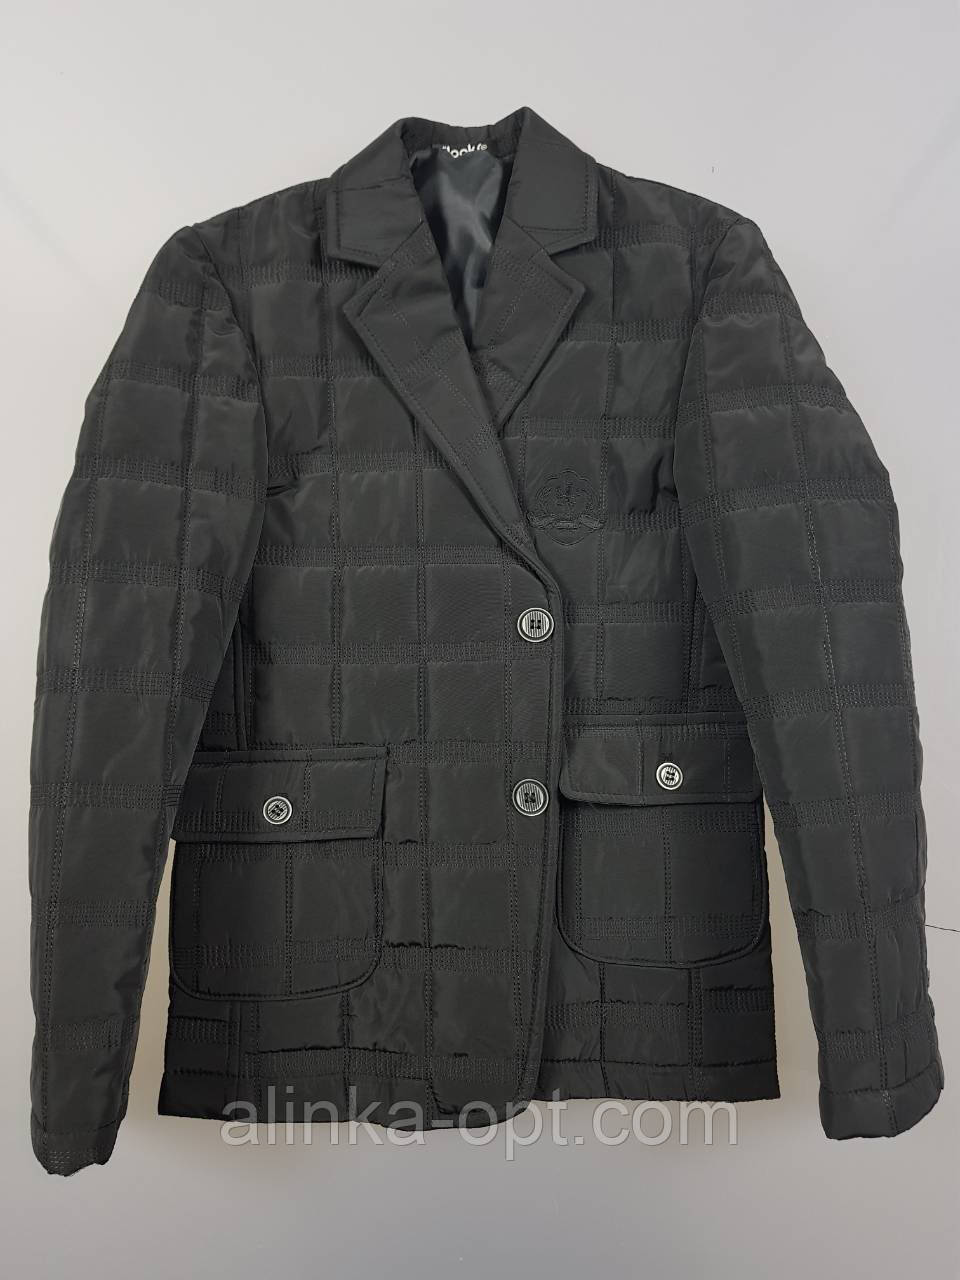 Куртка для мальчиков Looks оптом, 134-158 рр.